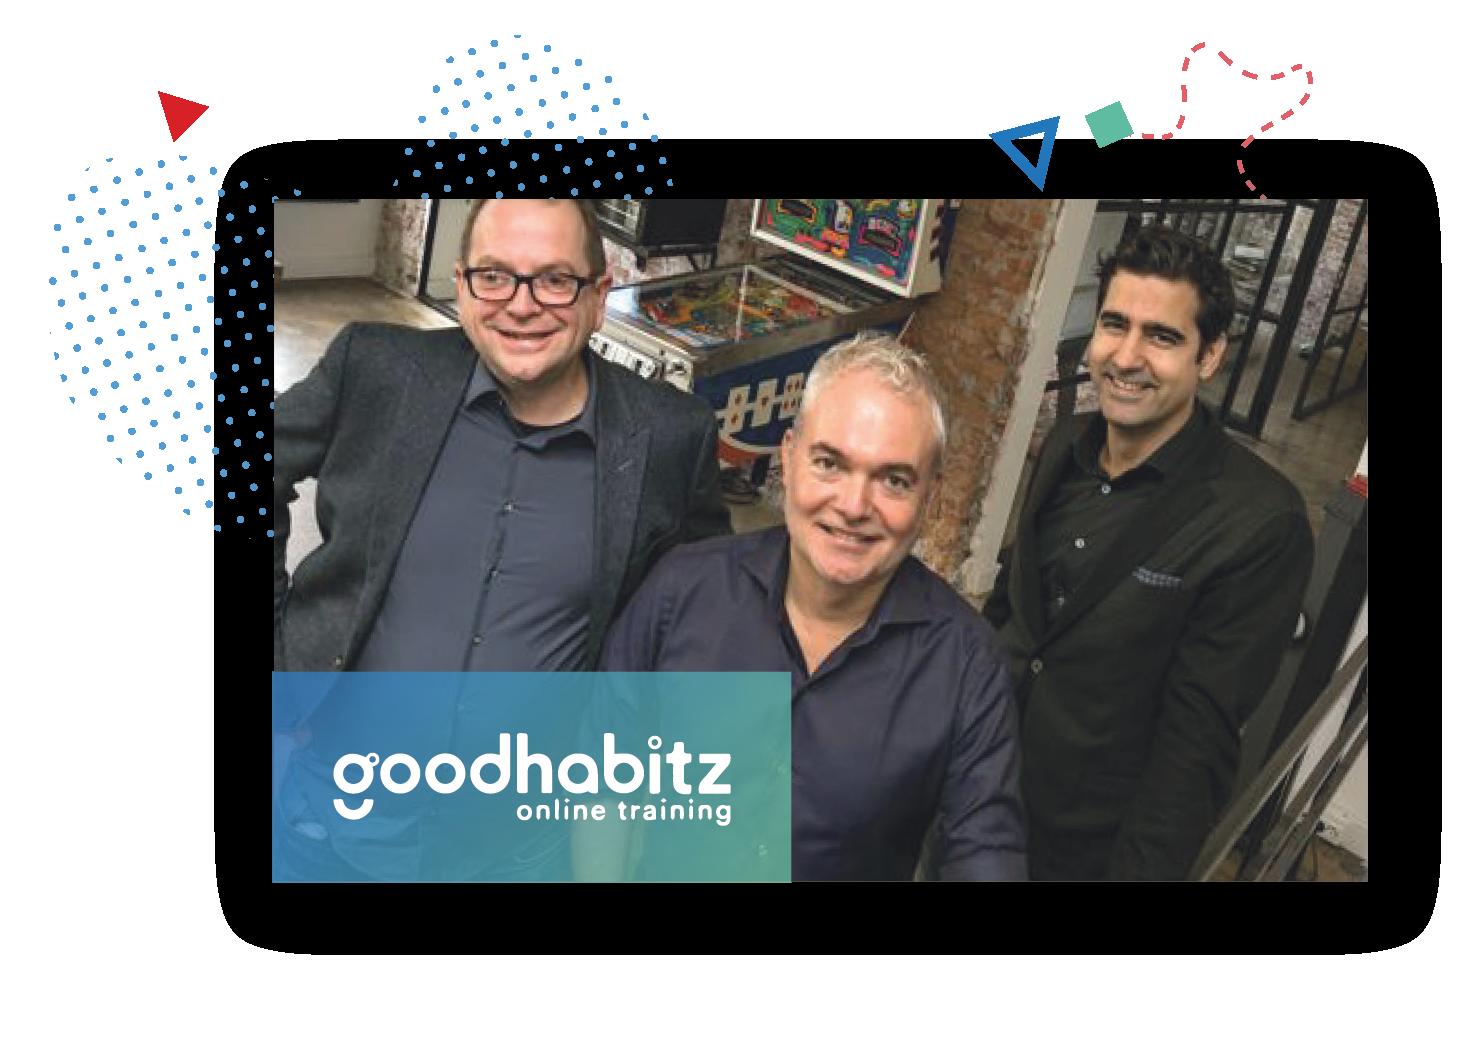 three goodhabitz employees